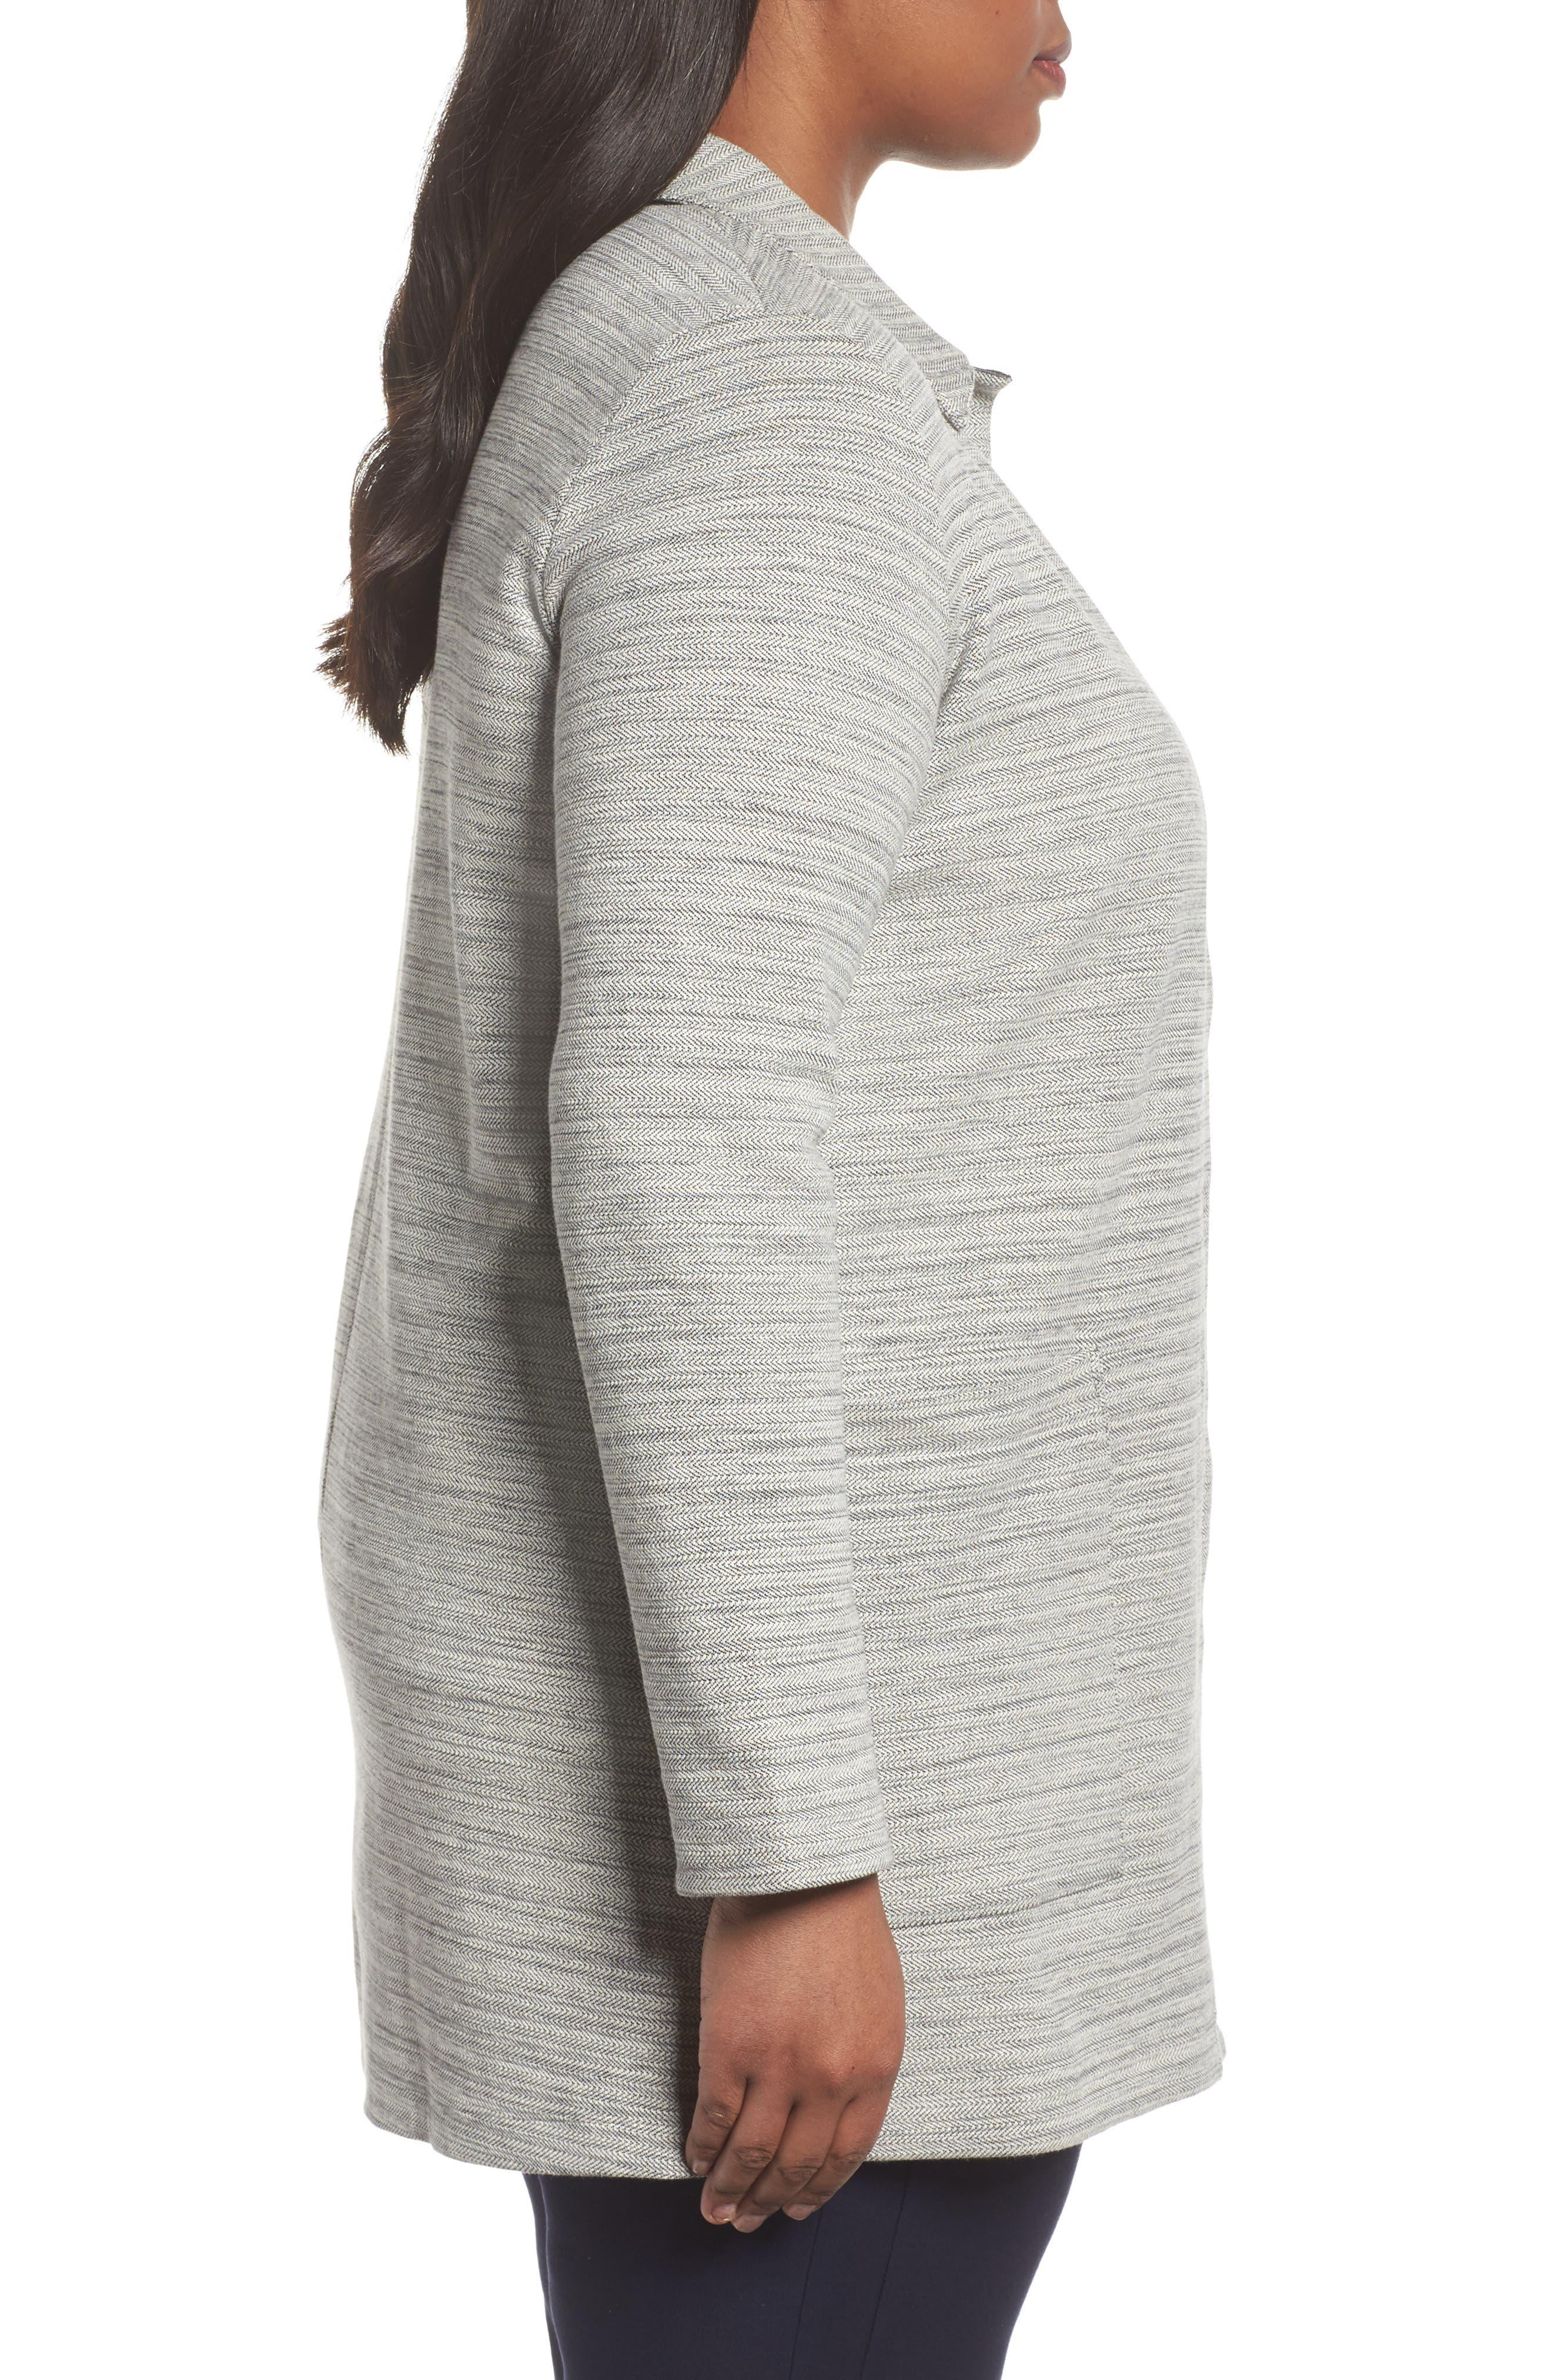 Cotton Blend Tweed Jacket,                             Alternate thumbnail 3, color,                             Dark Pearl